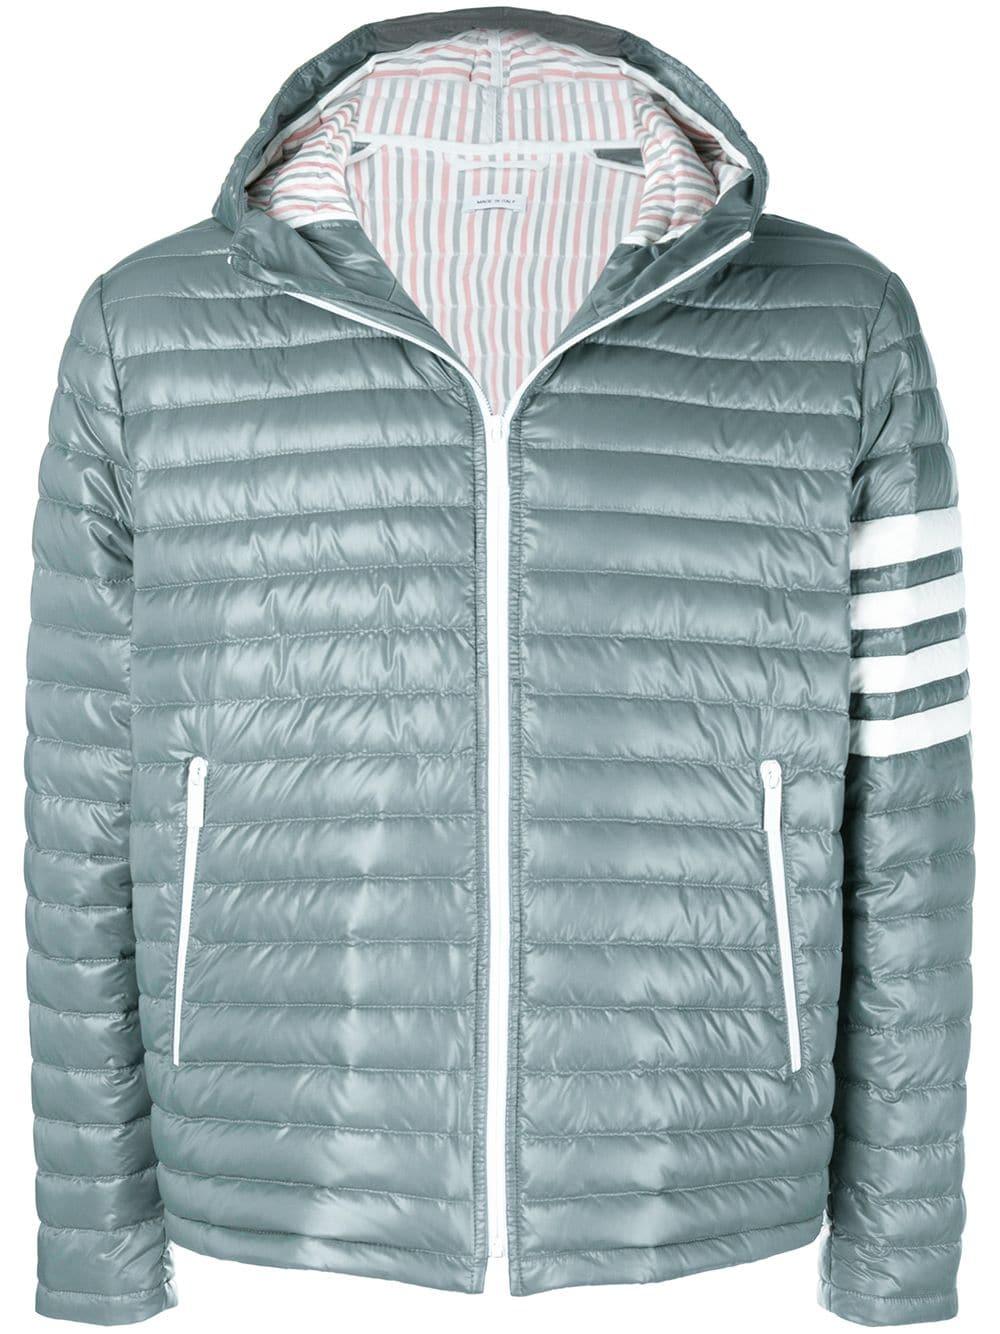 22b26b49f2 Thom Browne 4-Bar Stripe Satin Finish Quilted Down-Filled Tech Jacket - Grey